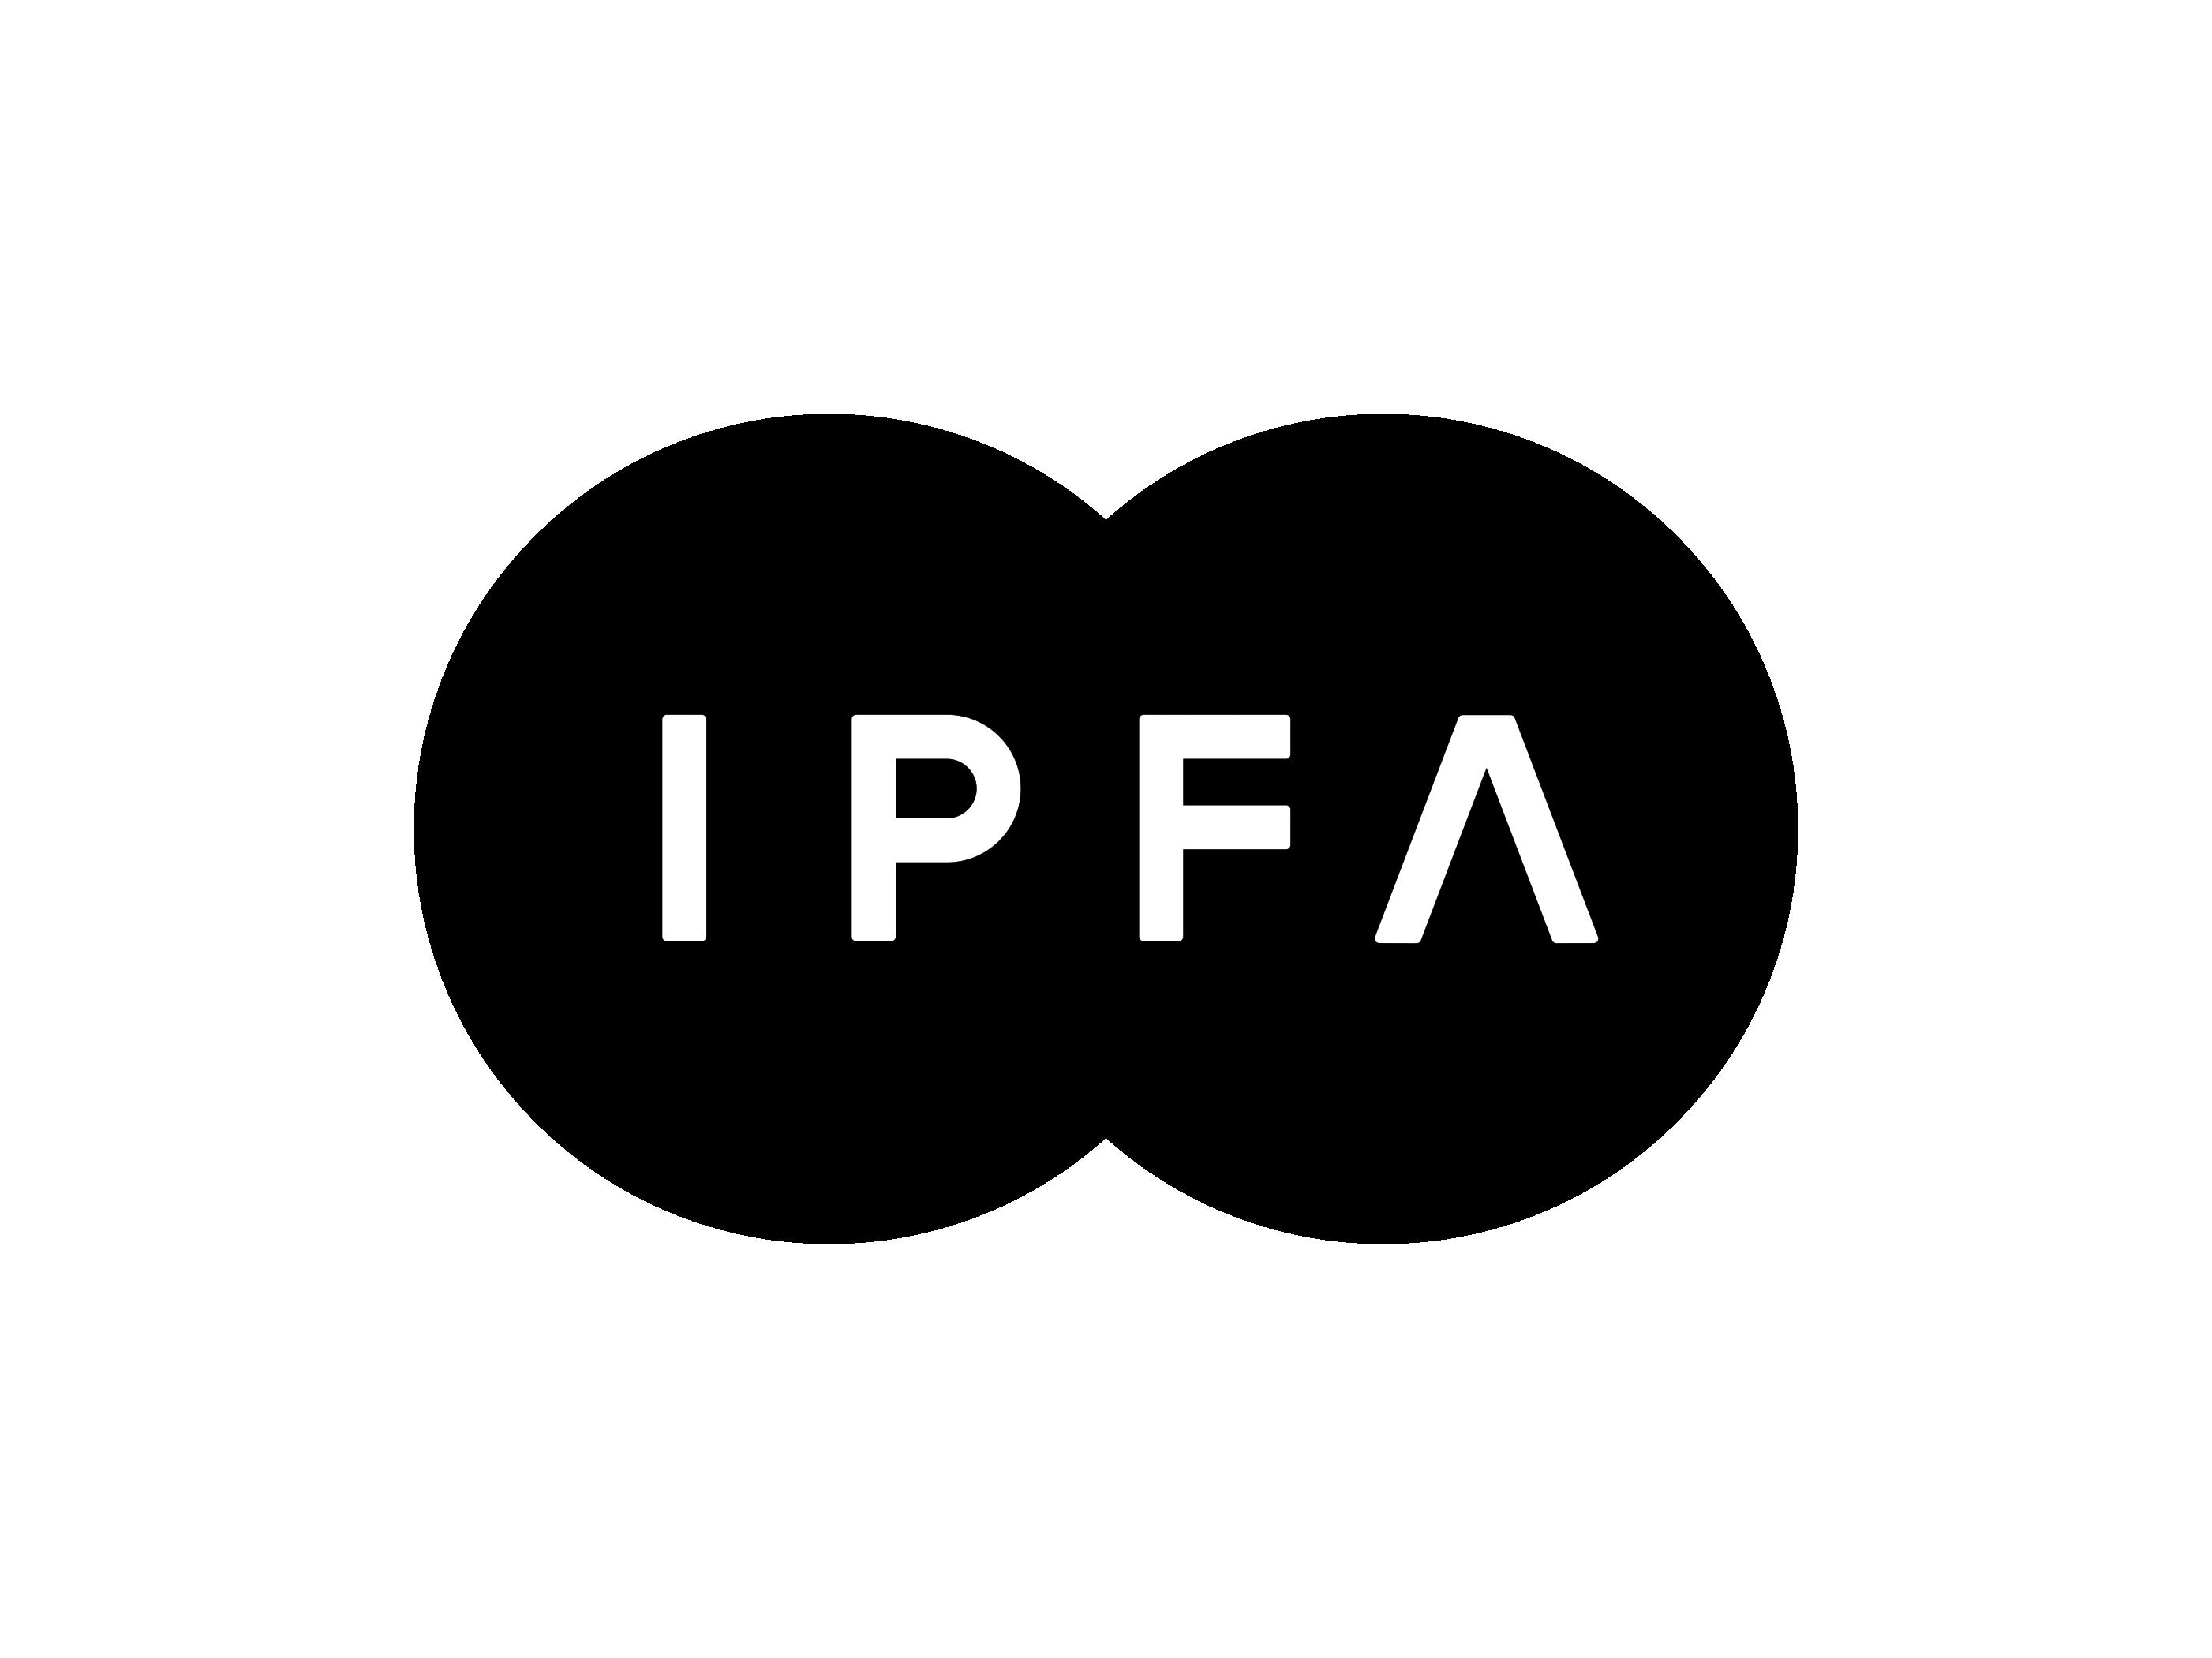 IPFA_BLK